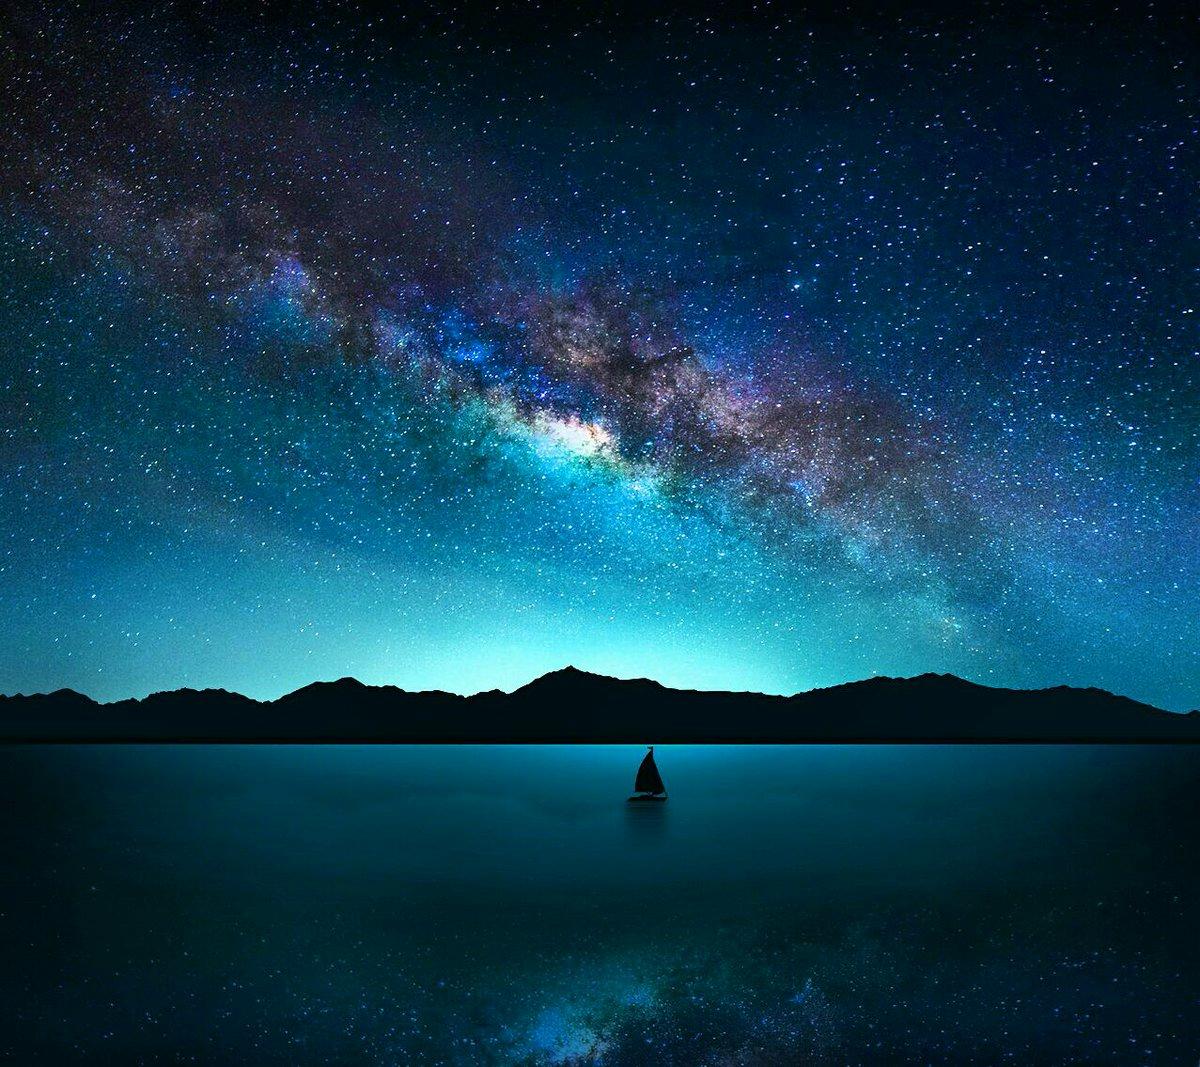 Resultado de imagen para splendida notte immagini